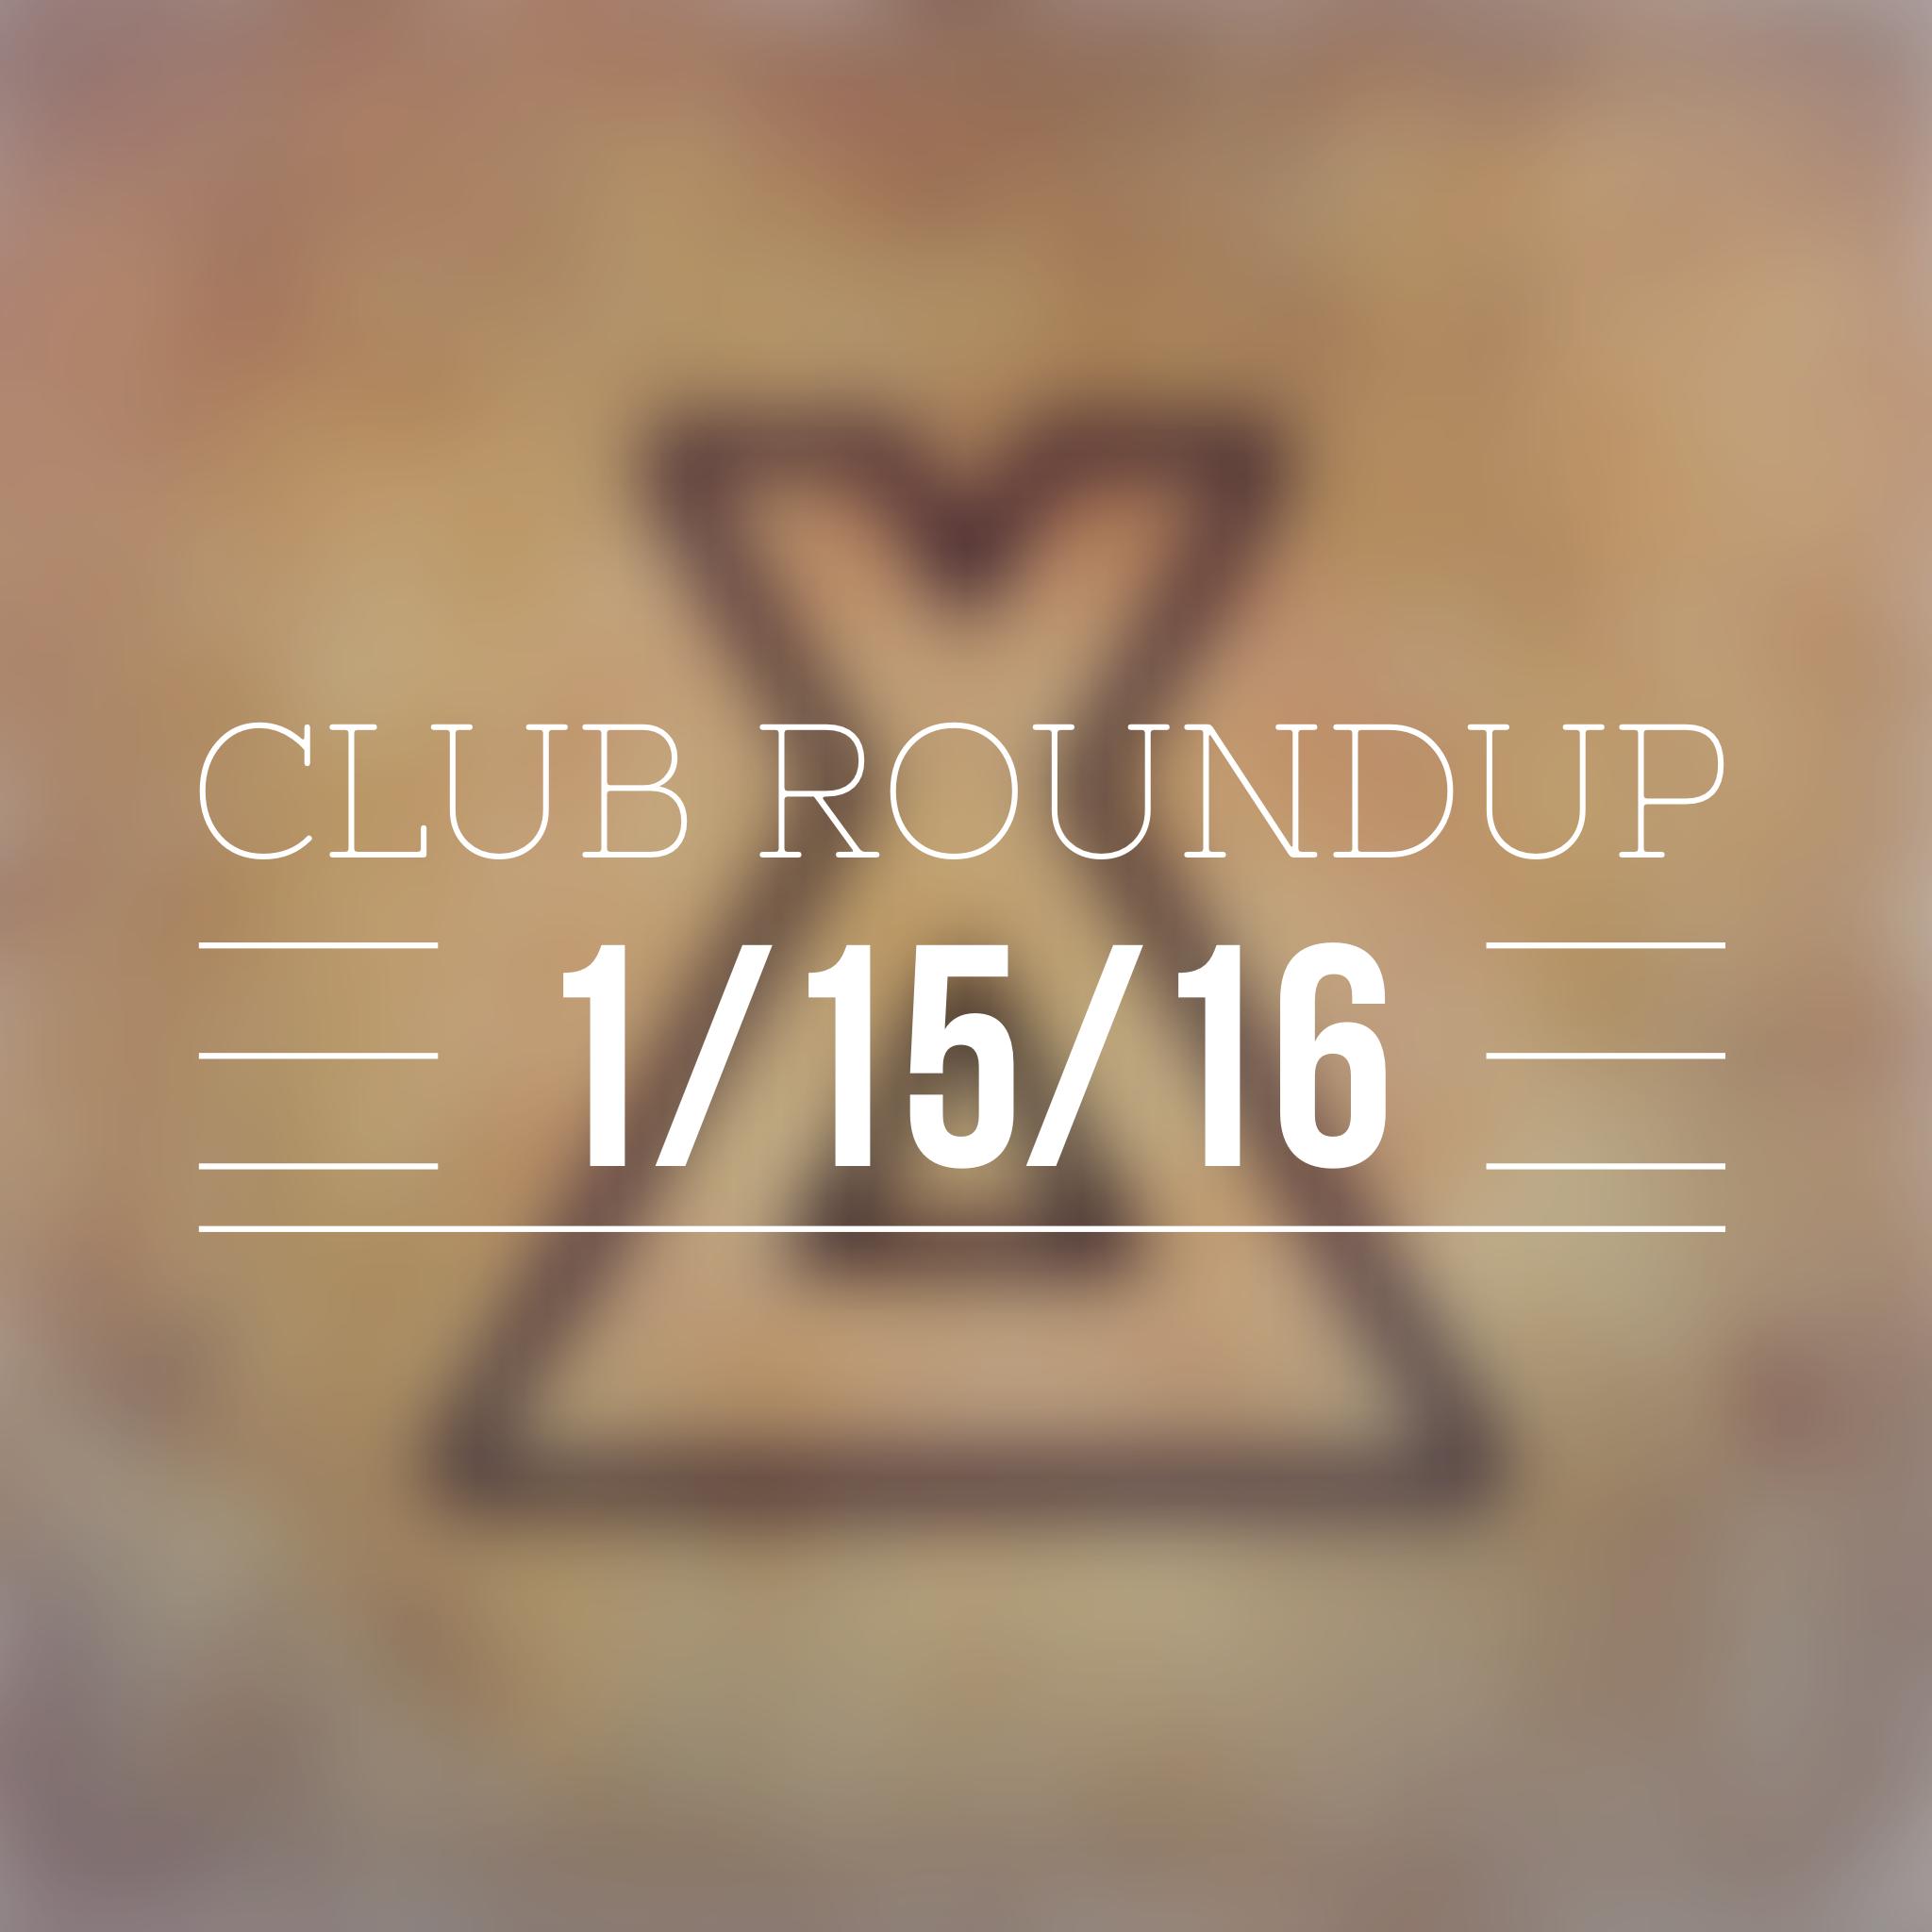 Club Roundup 1/15/16